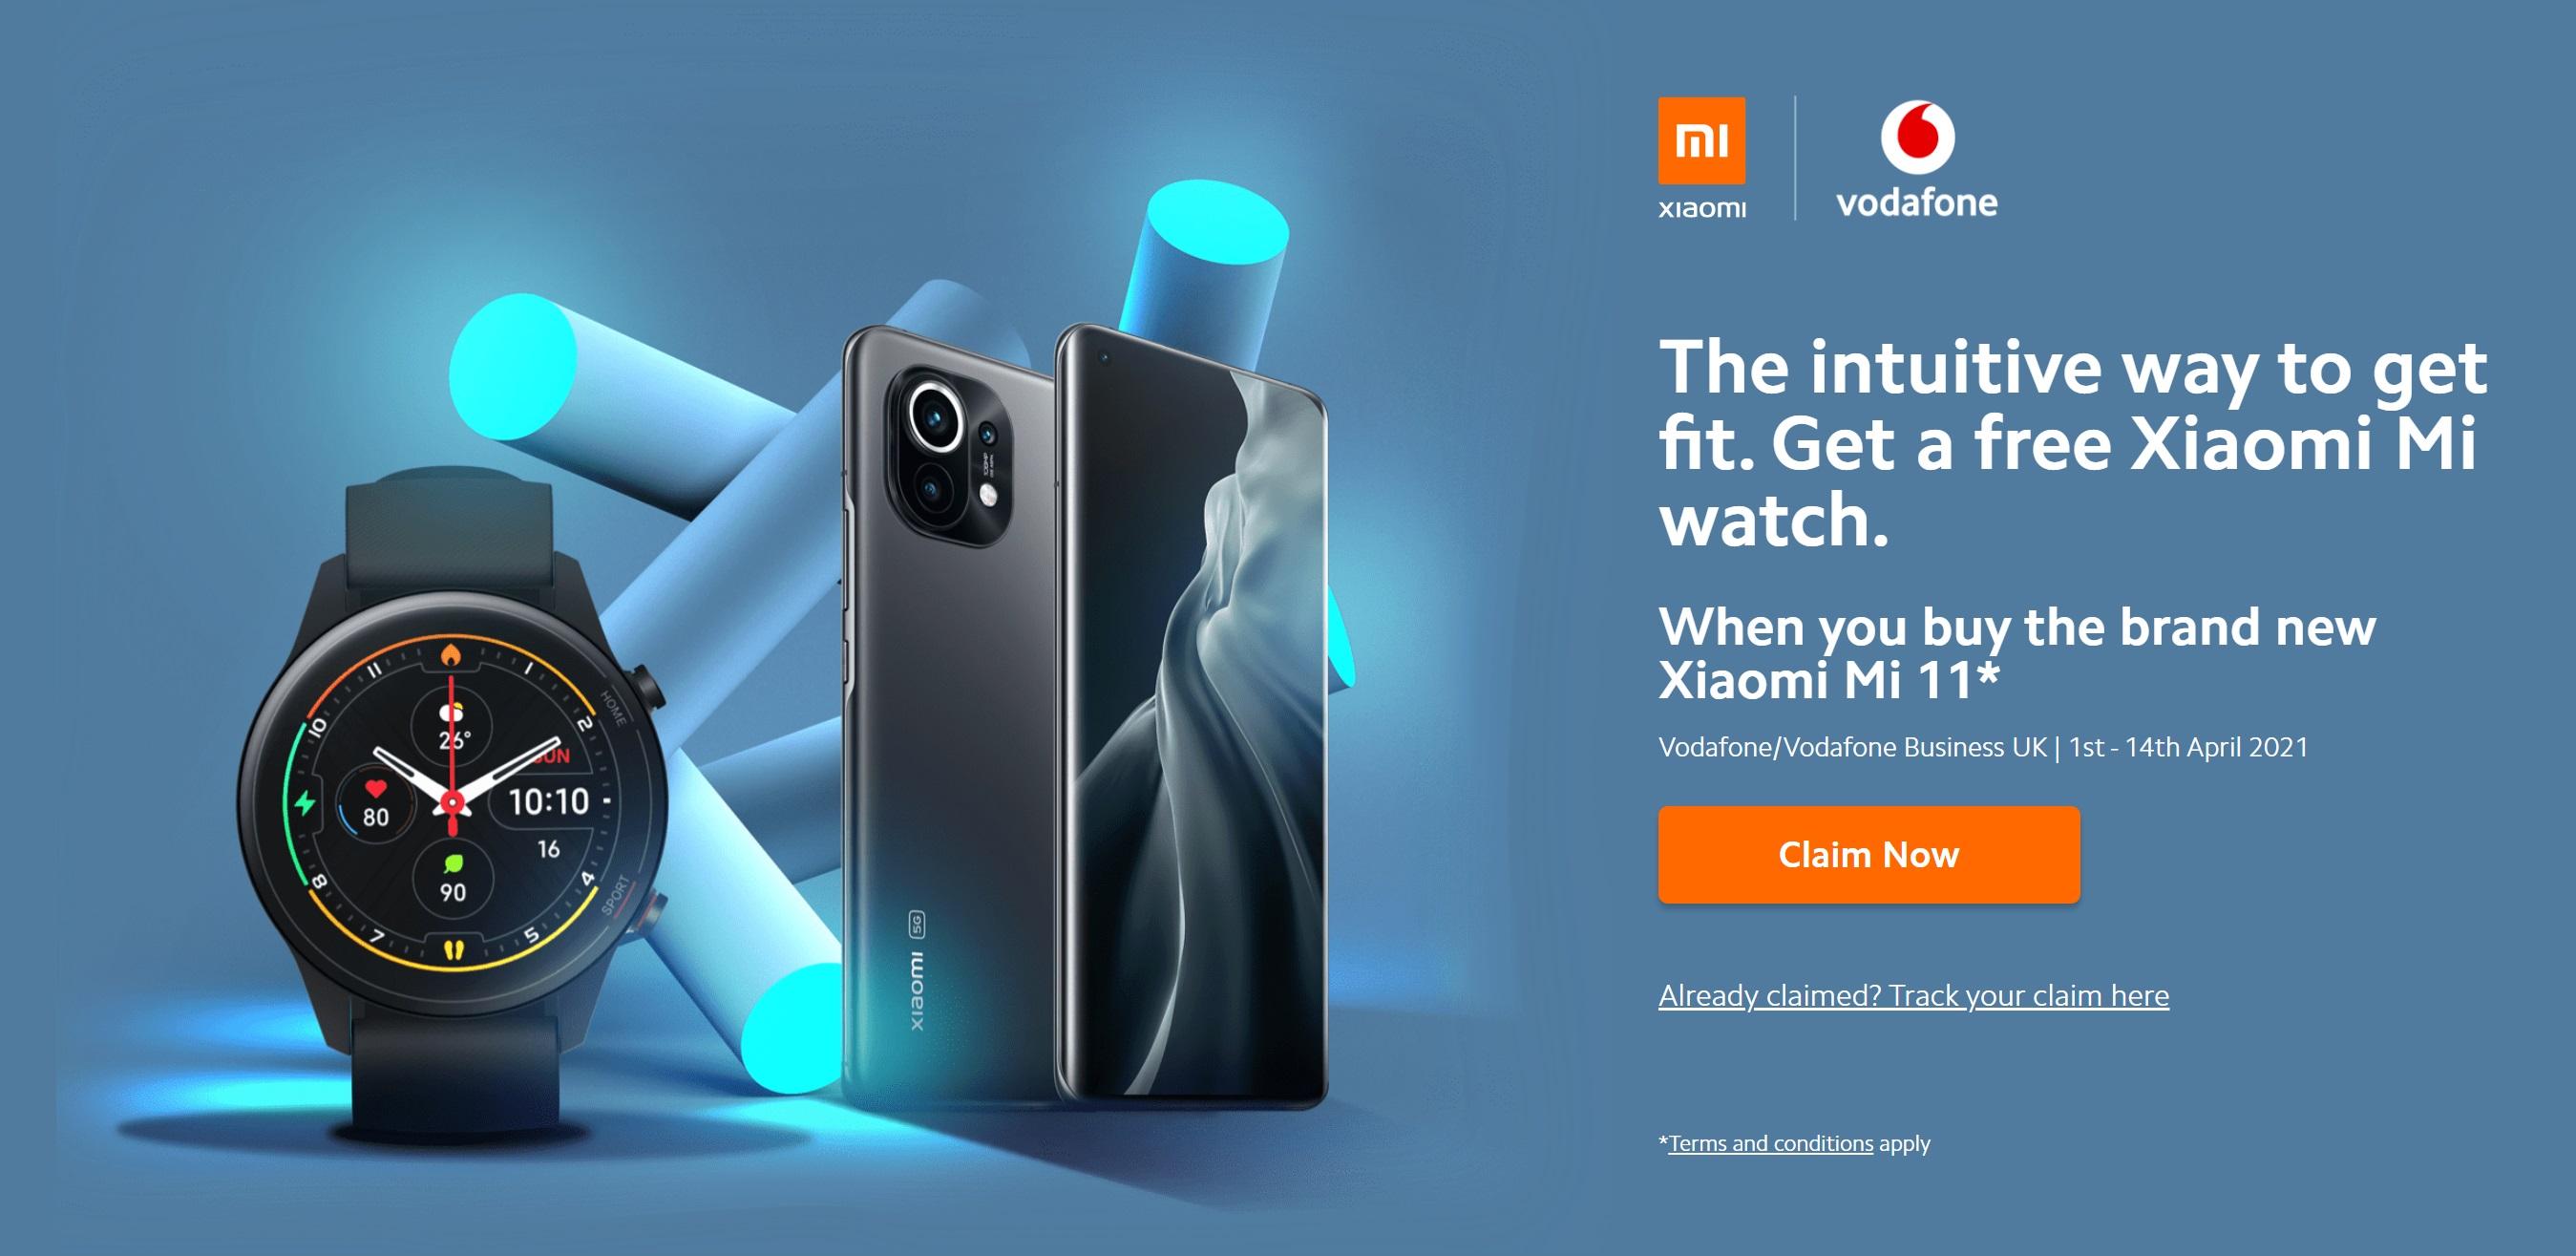 Xiaomi Mi 11 5G Deals with Free Xiaomi Mi Smart Watch worth £119